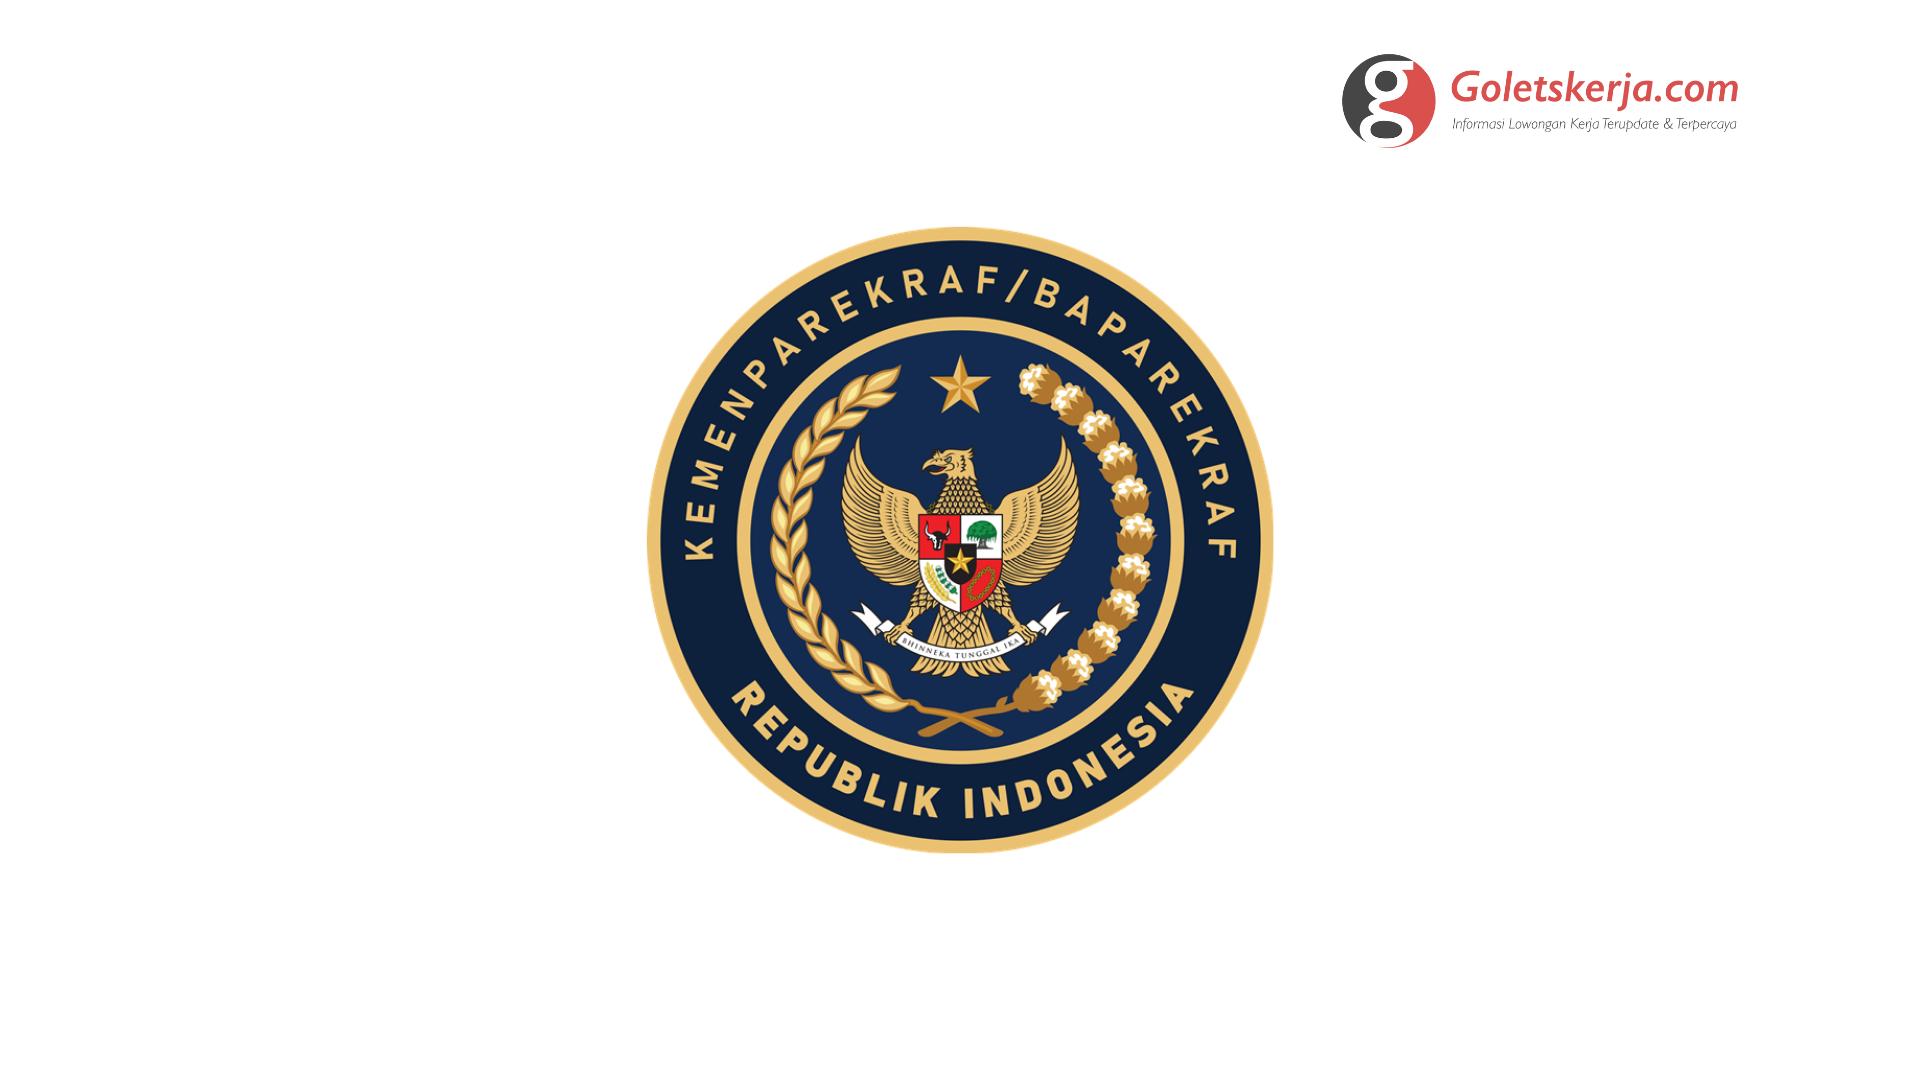 Seleksi Calon Aparatur Sipil Negara (CASN) Kementerian Pariwisata dan Ekonomi Kreatif/Badan Pariwisata dan Ekonomi Kreatif RI   TA 2021